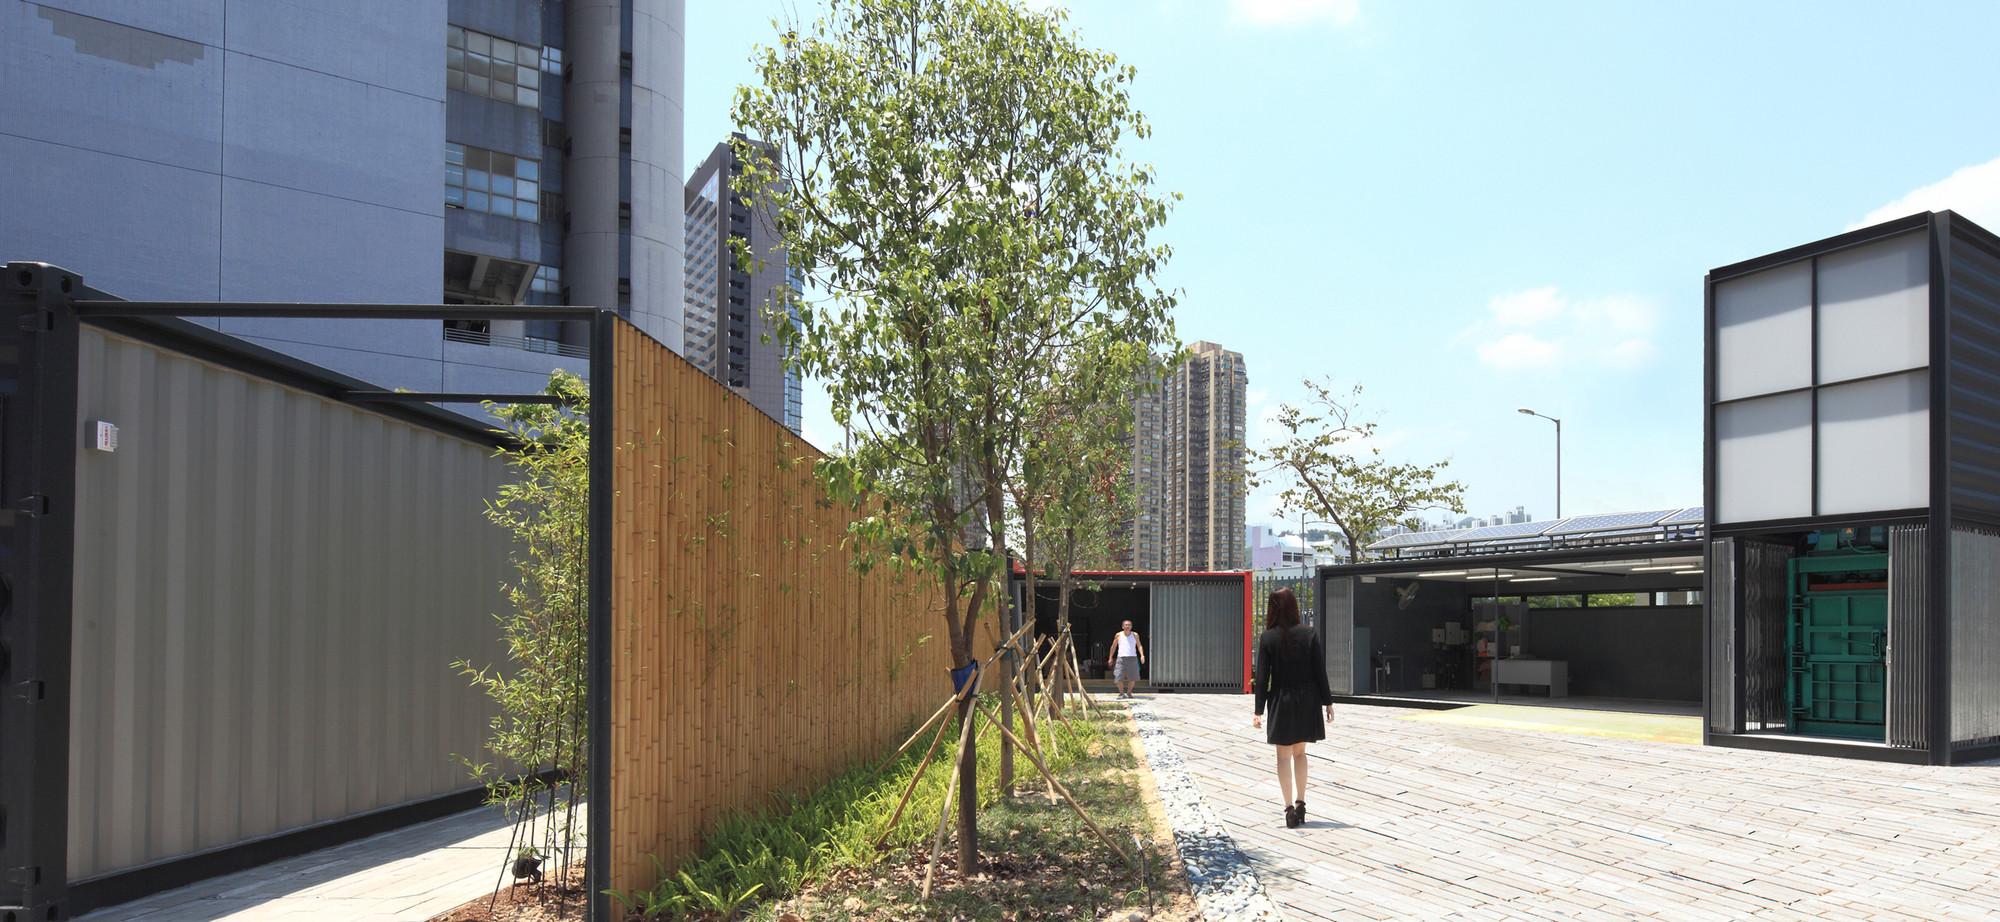 ommunity Green Station / Hong Kong rchitectural Services ... - ^